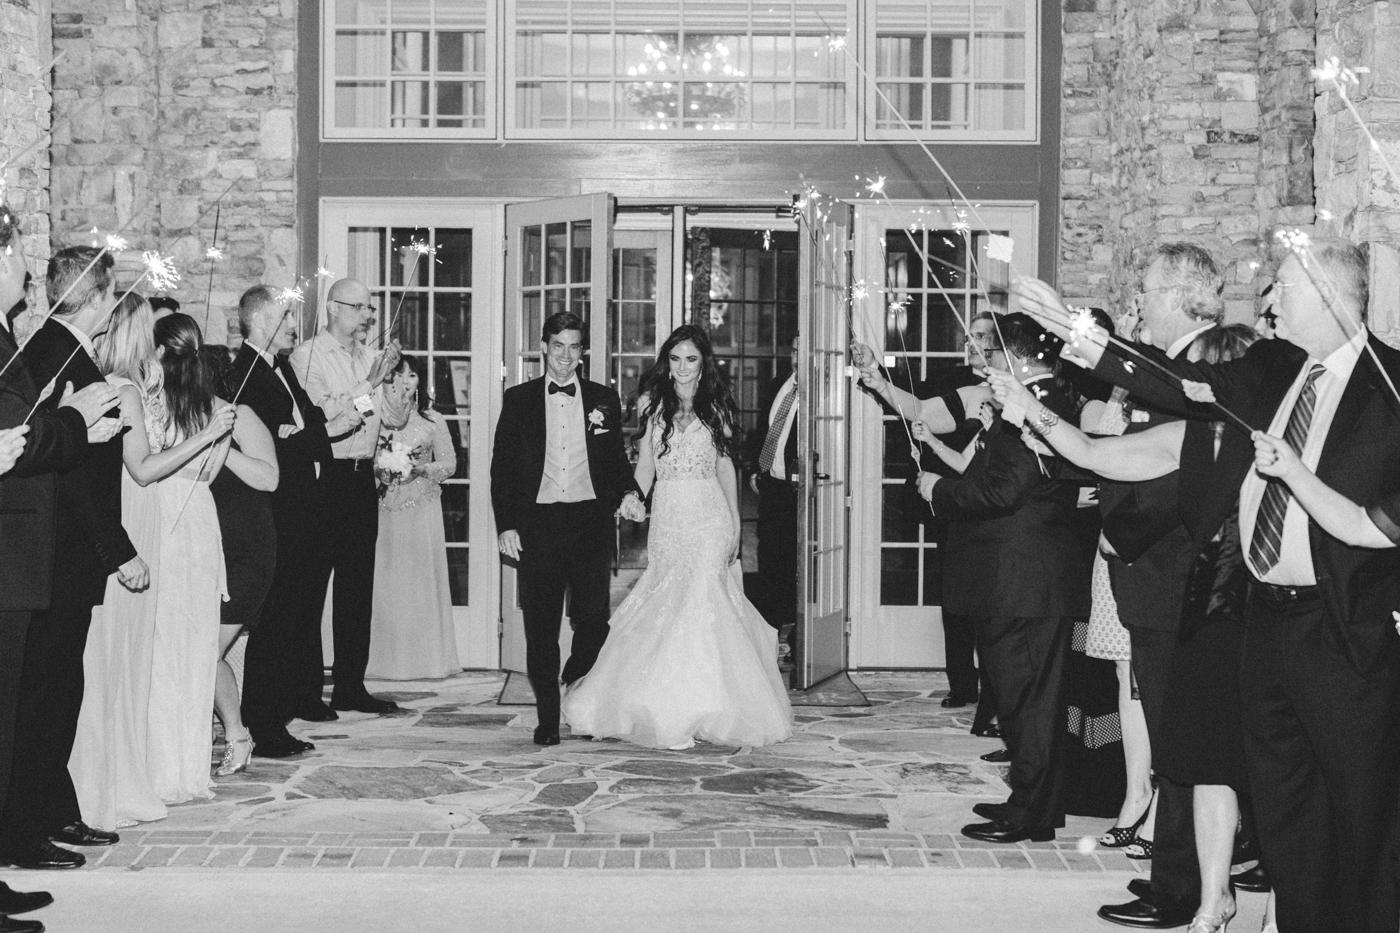 four corners photography best atlanta wedding photographer the manor golf and country club wedding photos southern weddings bride magazine wedding photos atlanta photographer-45.jpg